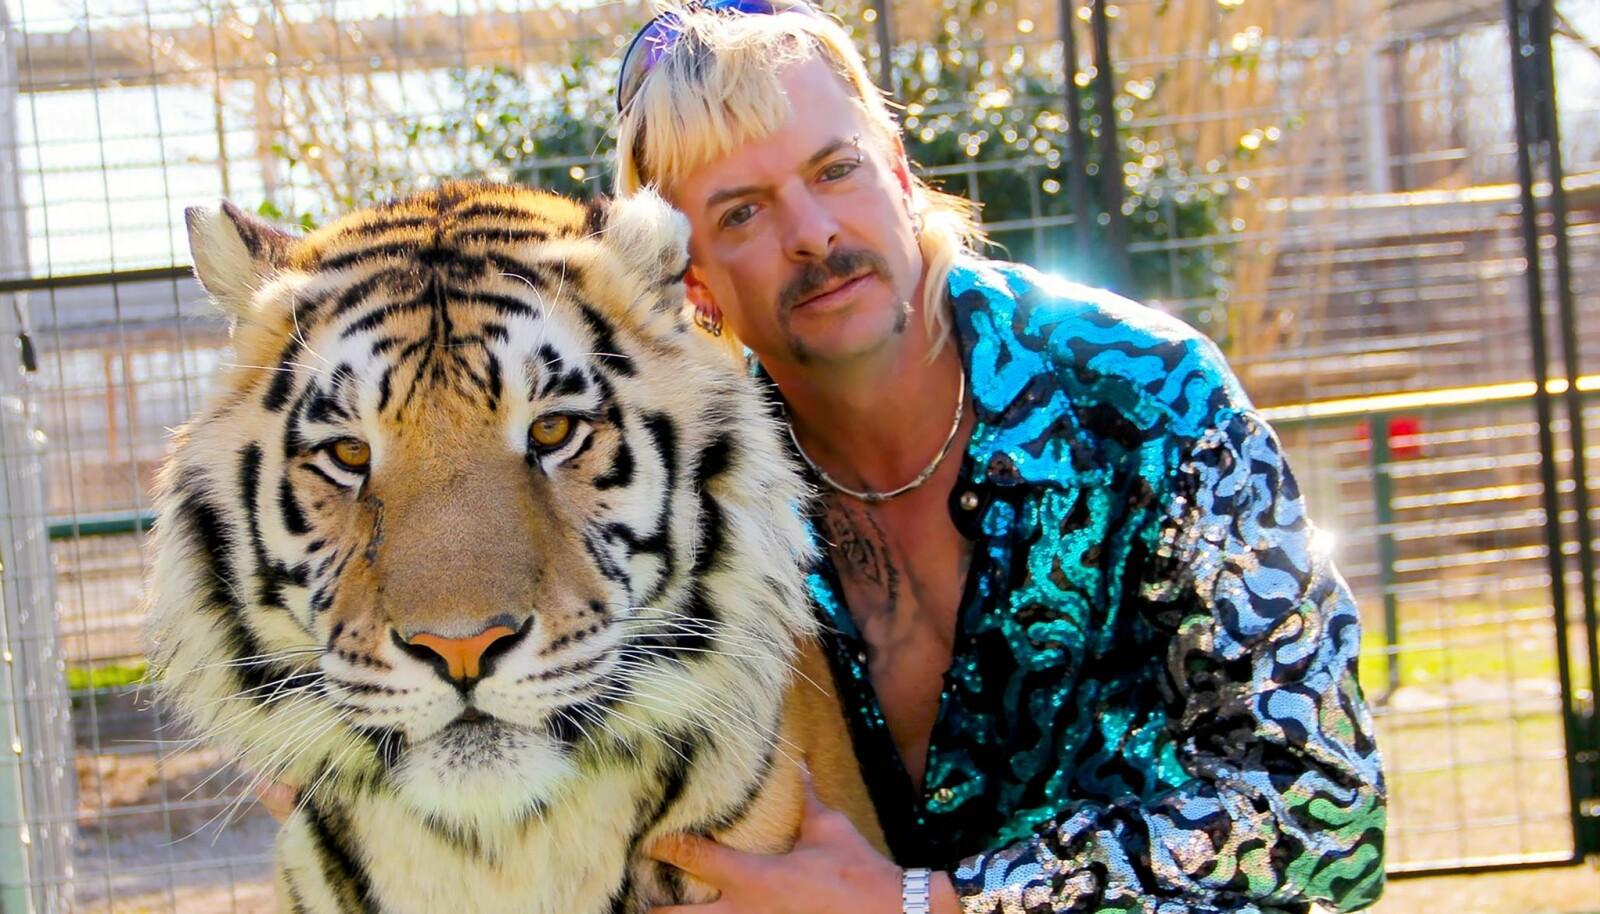 Stjernen i dokumentarserien «Tiger King», Joe Exotic, beskriver seg selv som en «homofil, bevæpnet cowboy med hockeysveis».